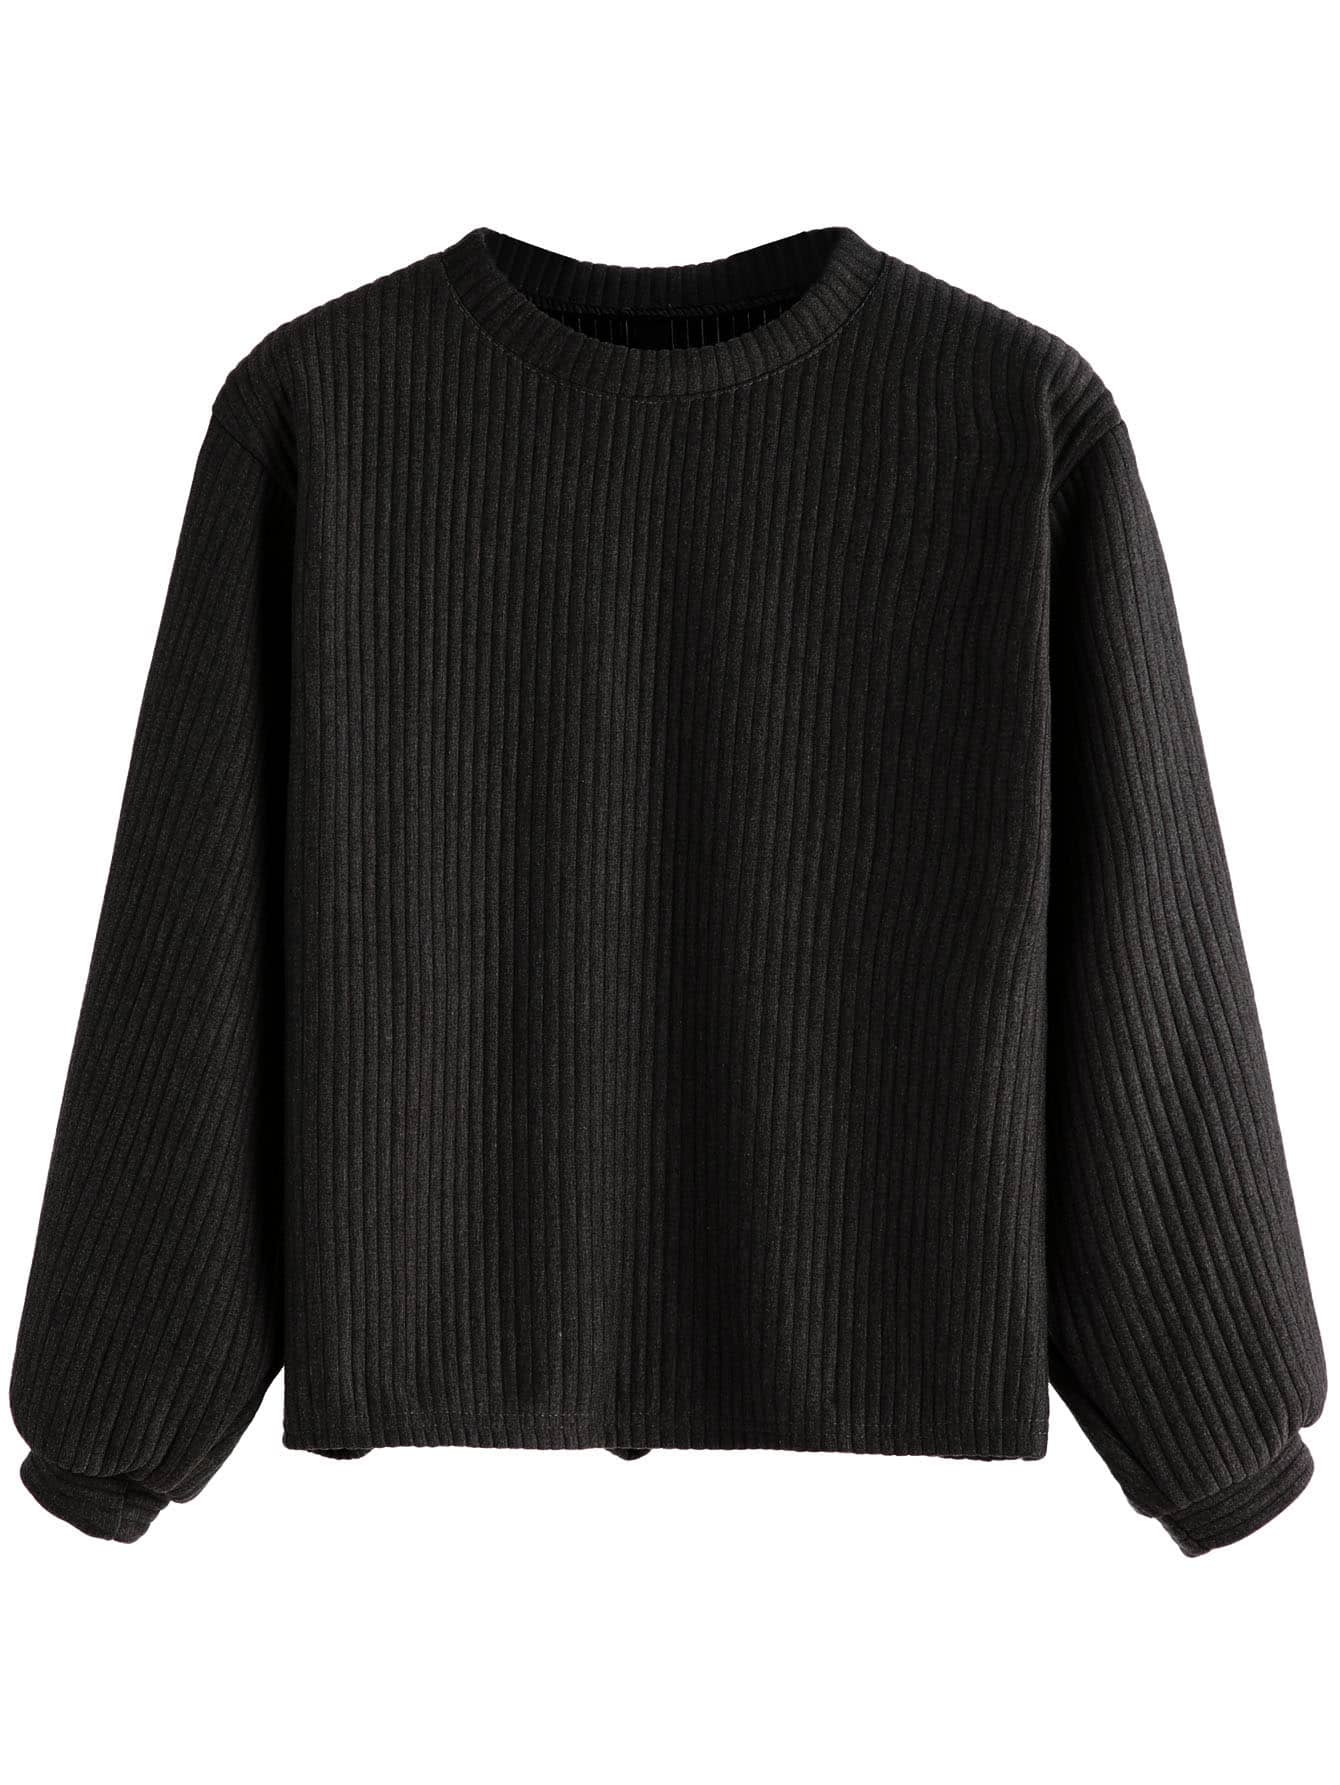 Black Long Sleeve Ribbed Sweatshirt sweatshirt160926103